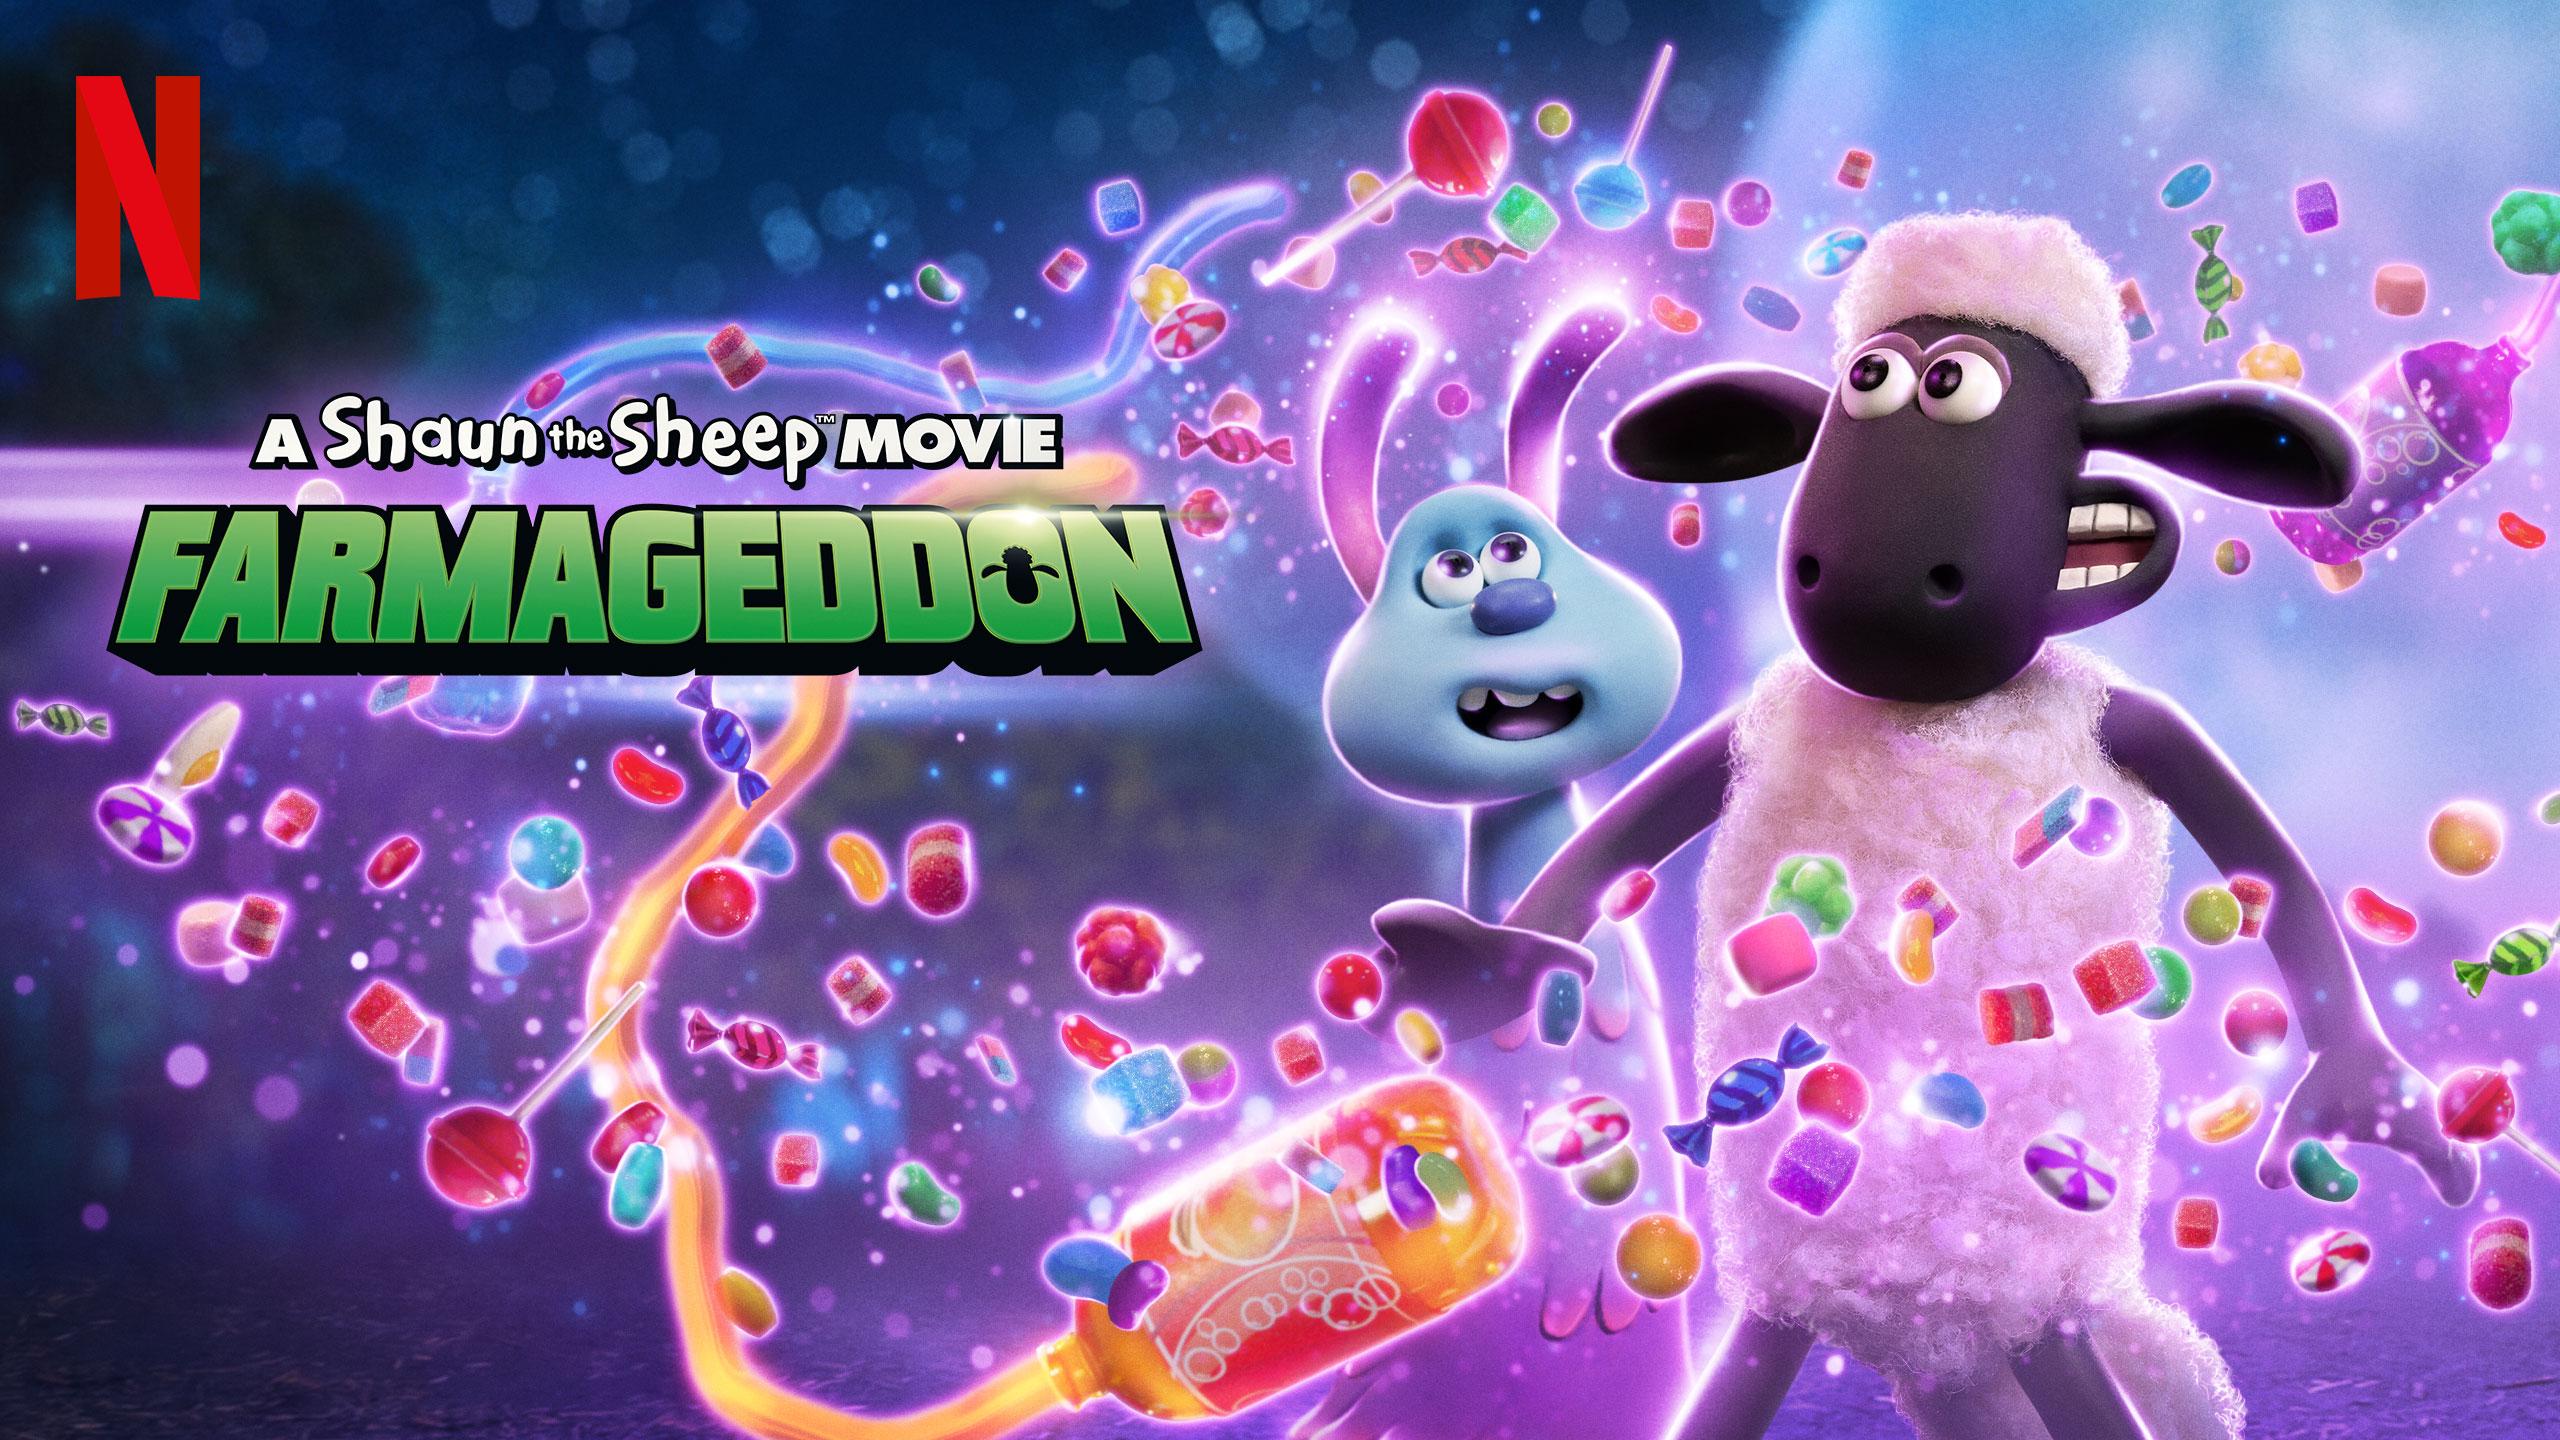 A Shaun the Sheep Movie: Farmageddon | Netflix VDA Concept, Finishing & Illustration